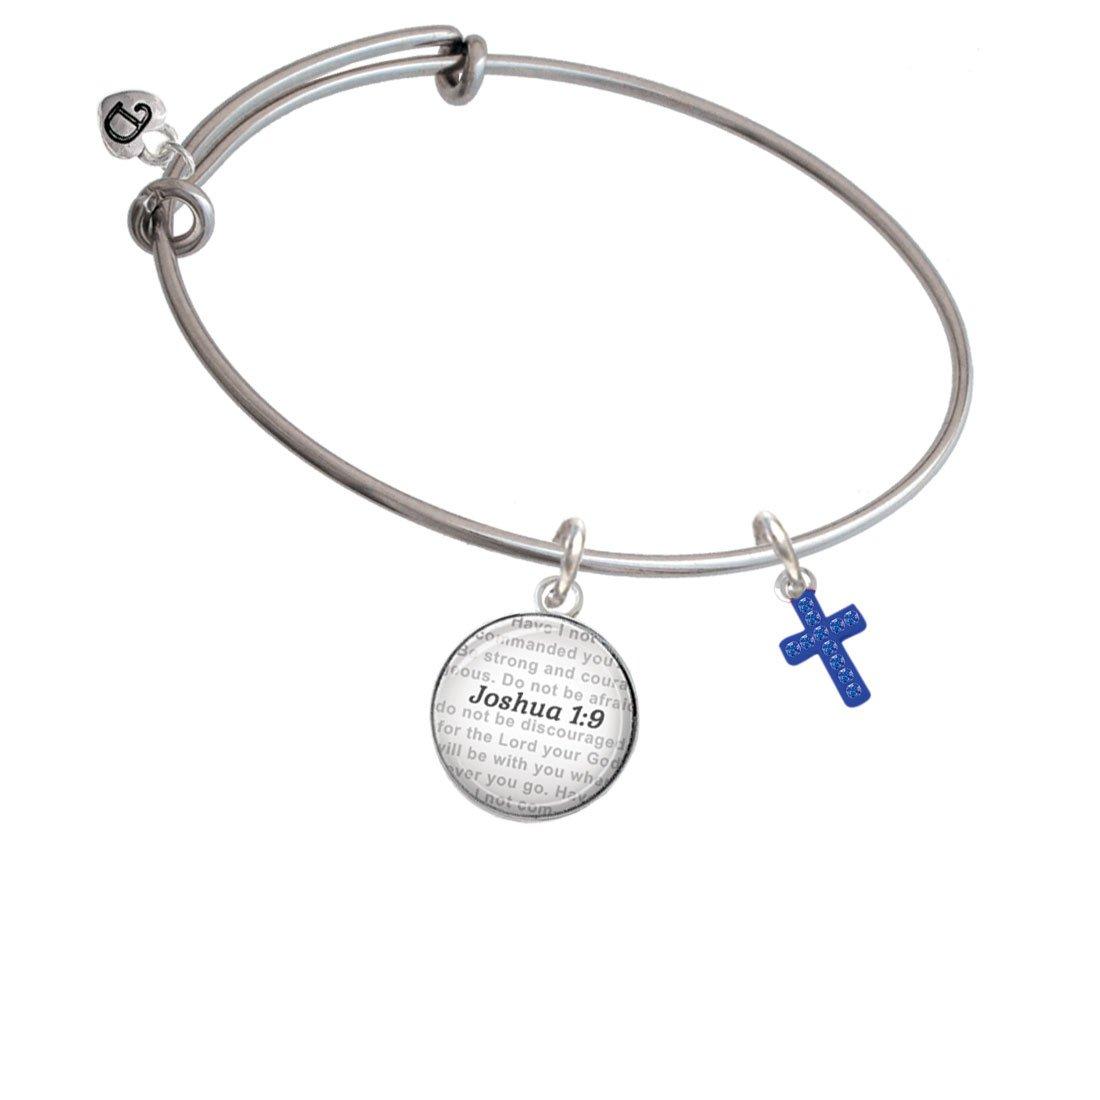 Bible Verse Joshua 1:9 Glass Dome Bangle Bracelet Silvertone Small Enamel Crystal Cross